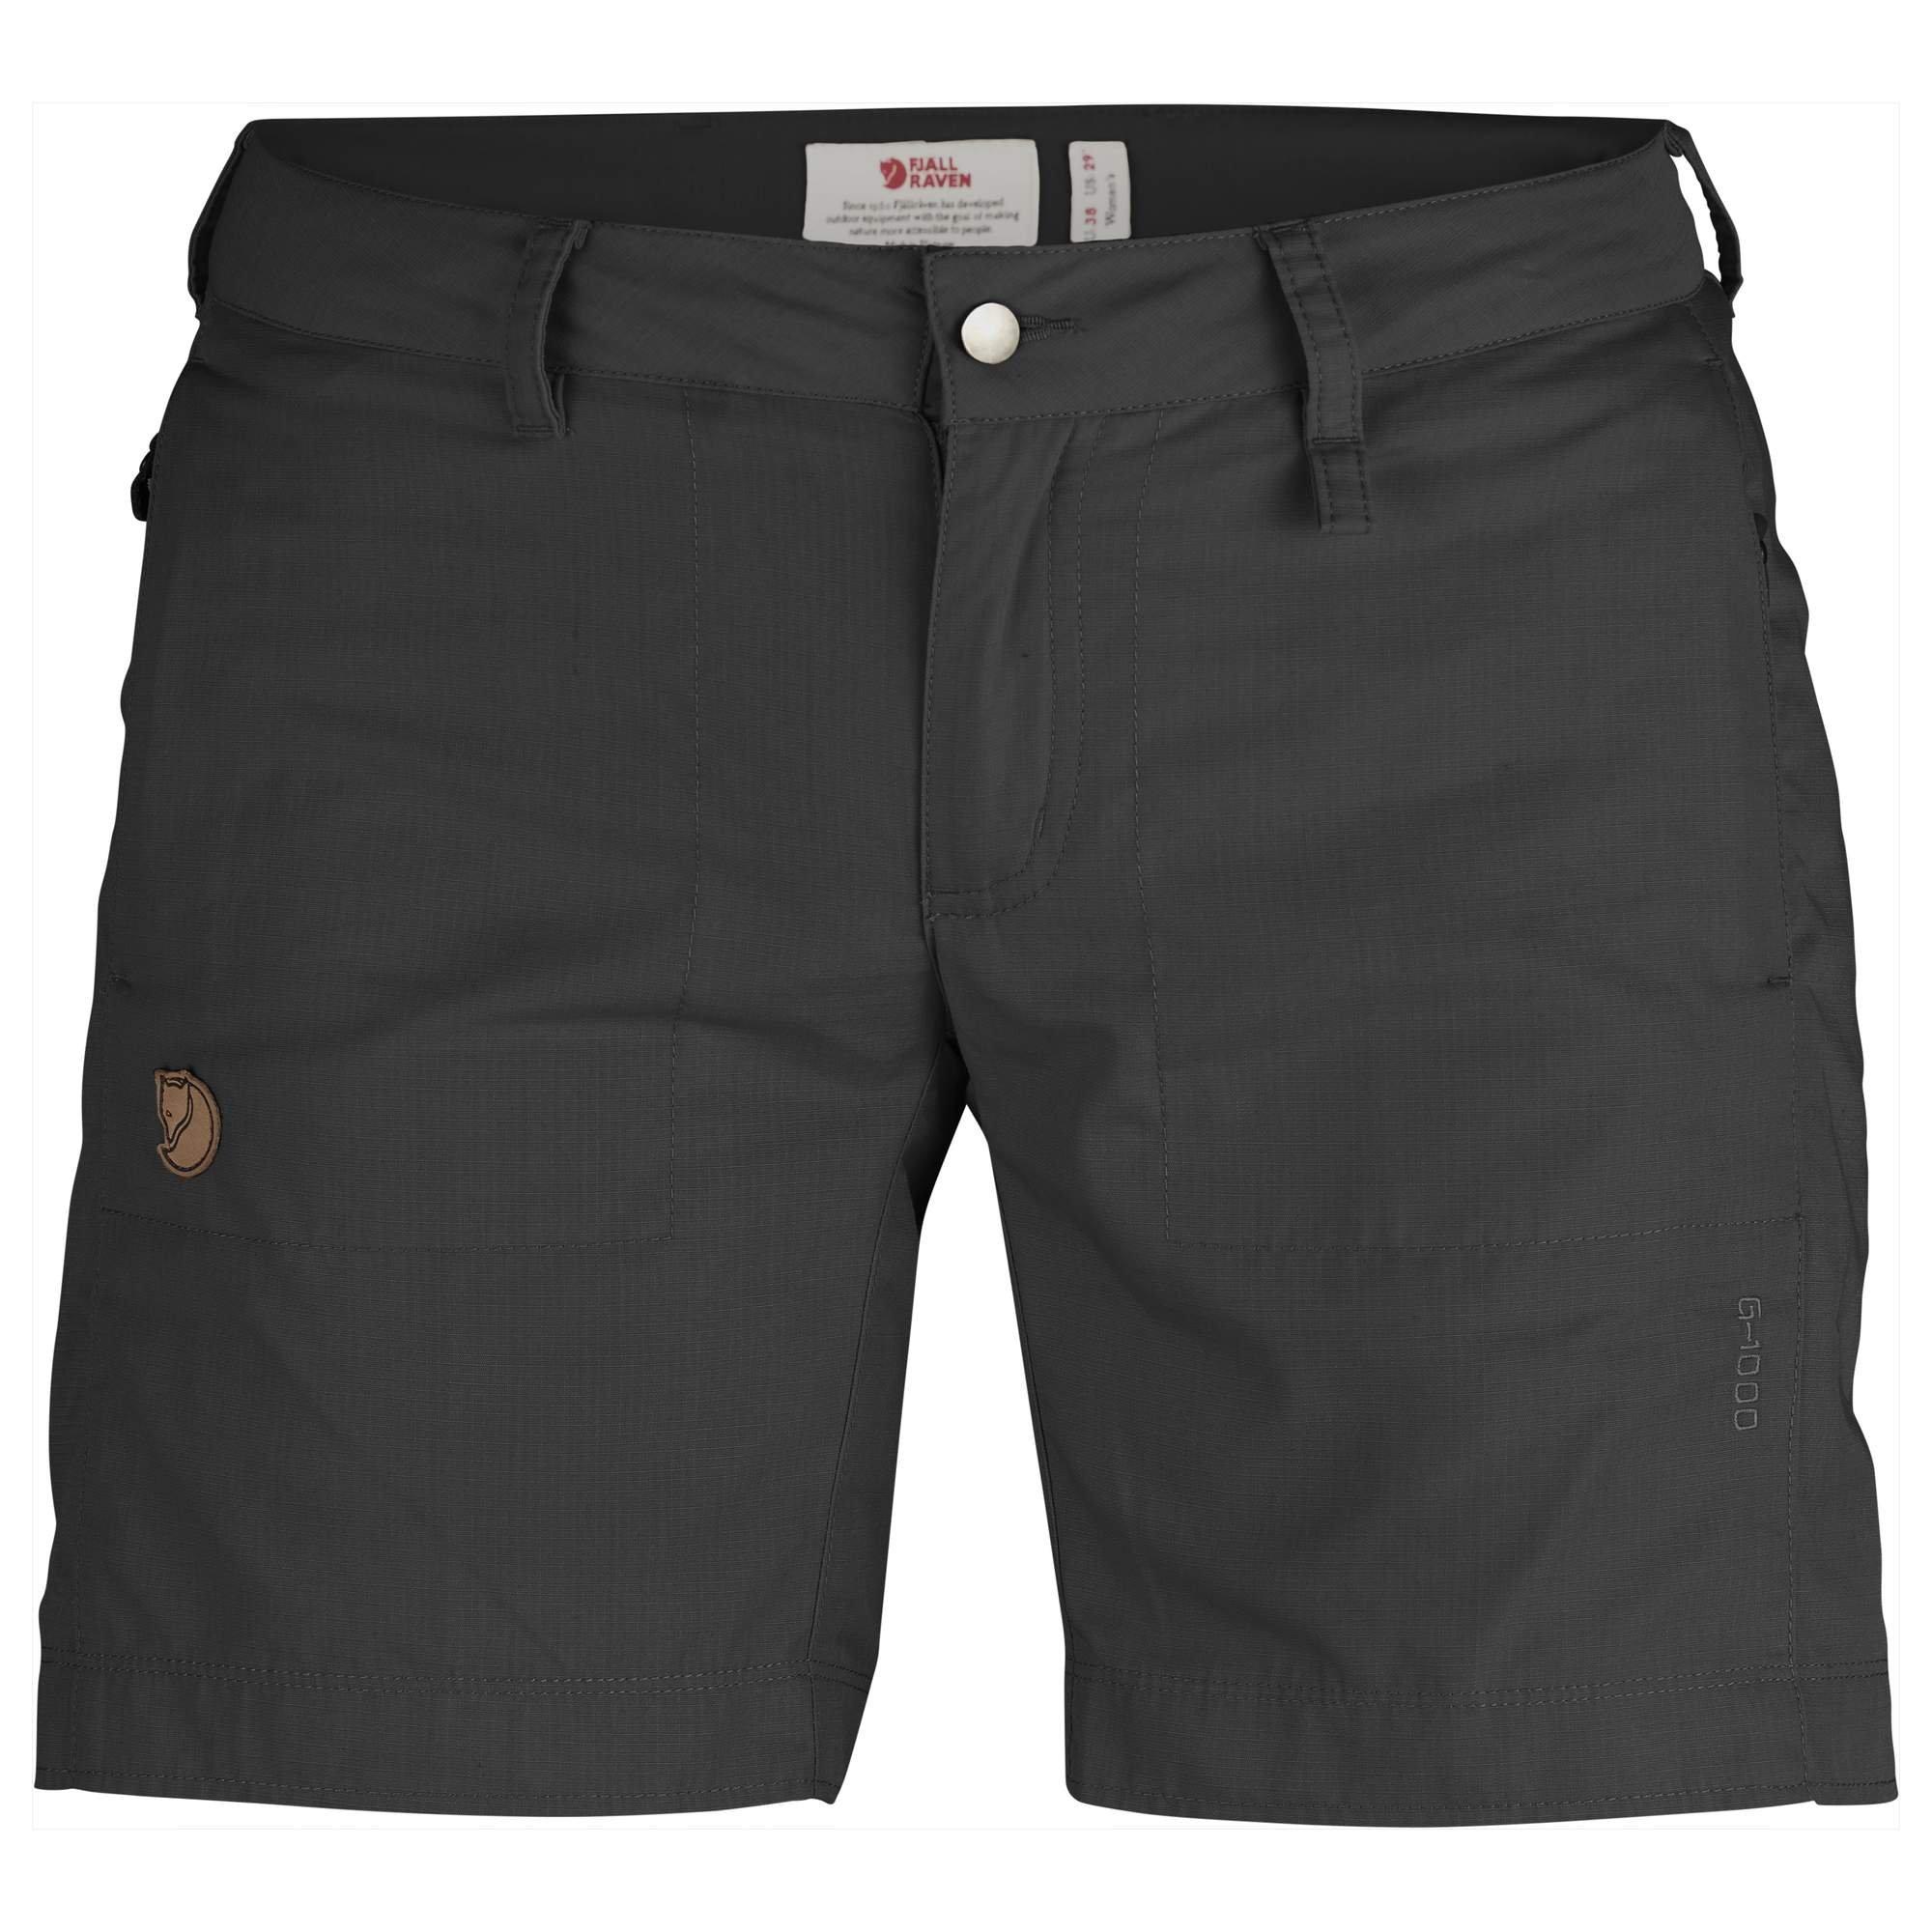 Fjallraven - Women's Abisko Shade Shorts, Dark Grey, 48 by Fjallraven